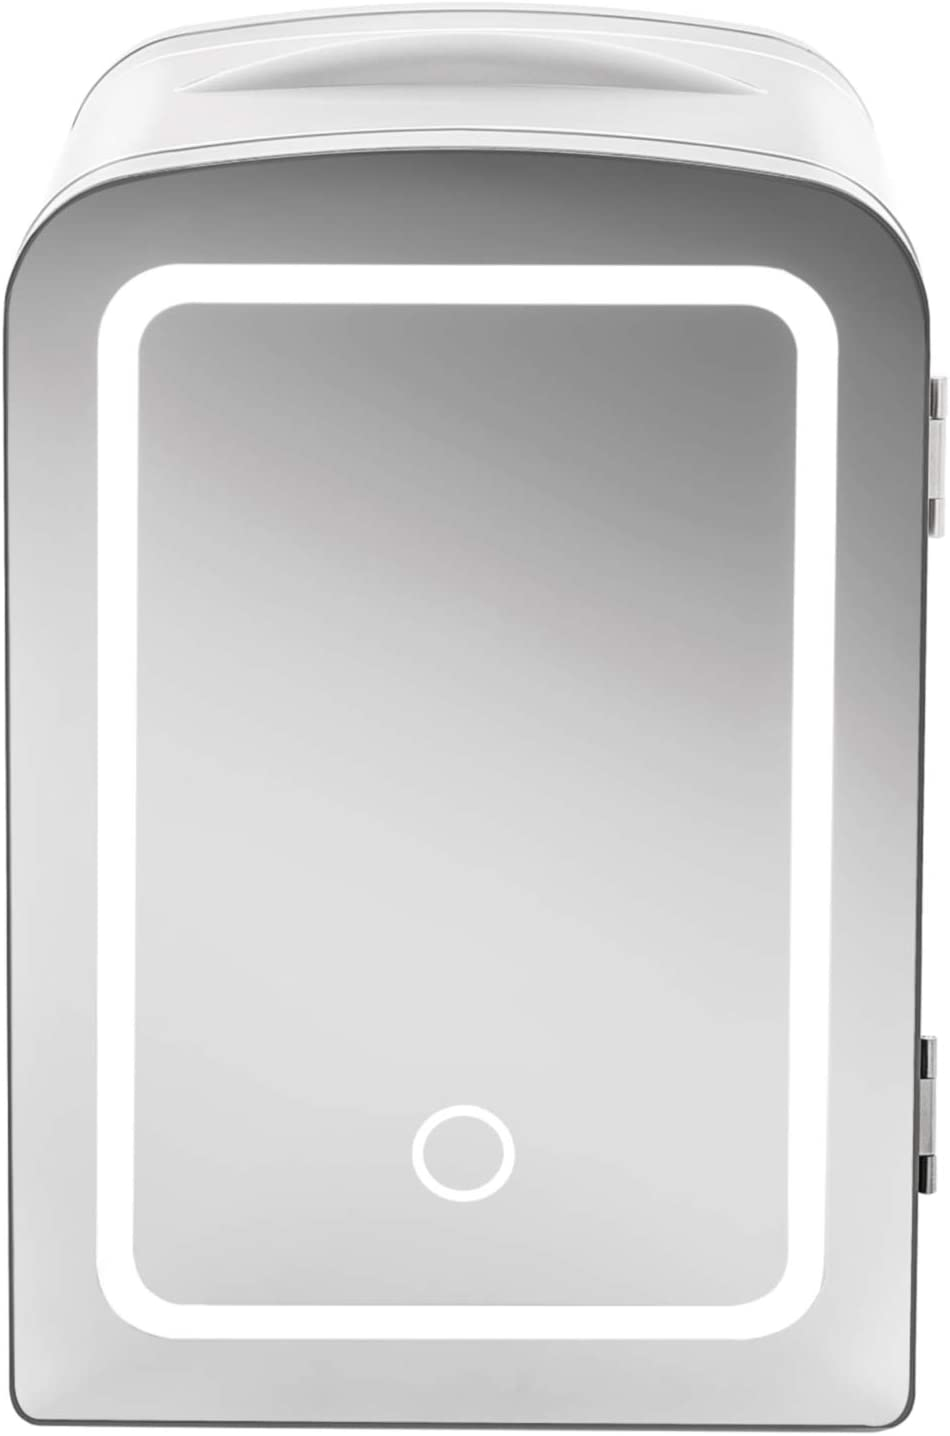 Chefman Portable Mirrored Beauty Fridge With LED Lighting, 4 Liter Mini Refrigerator